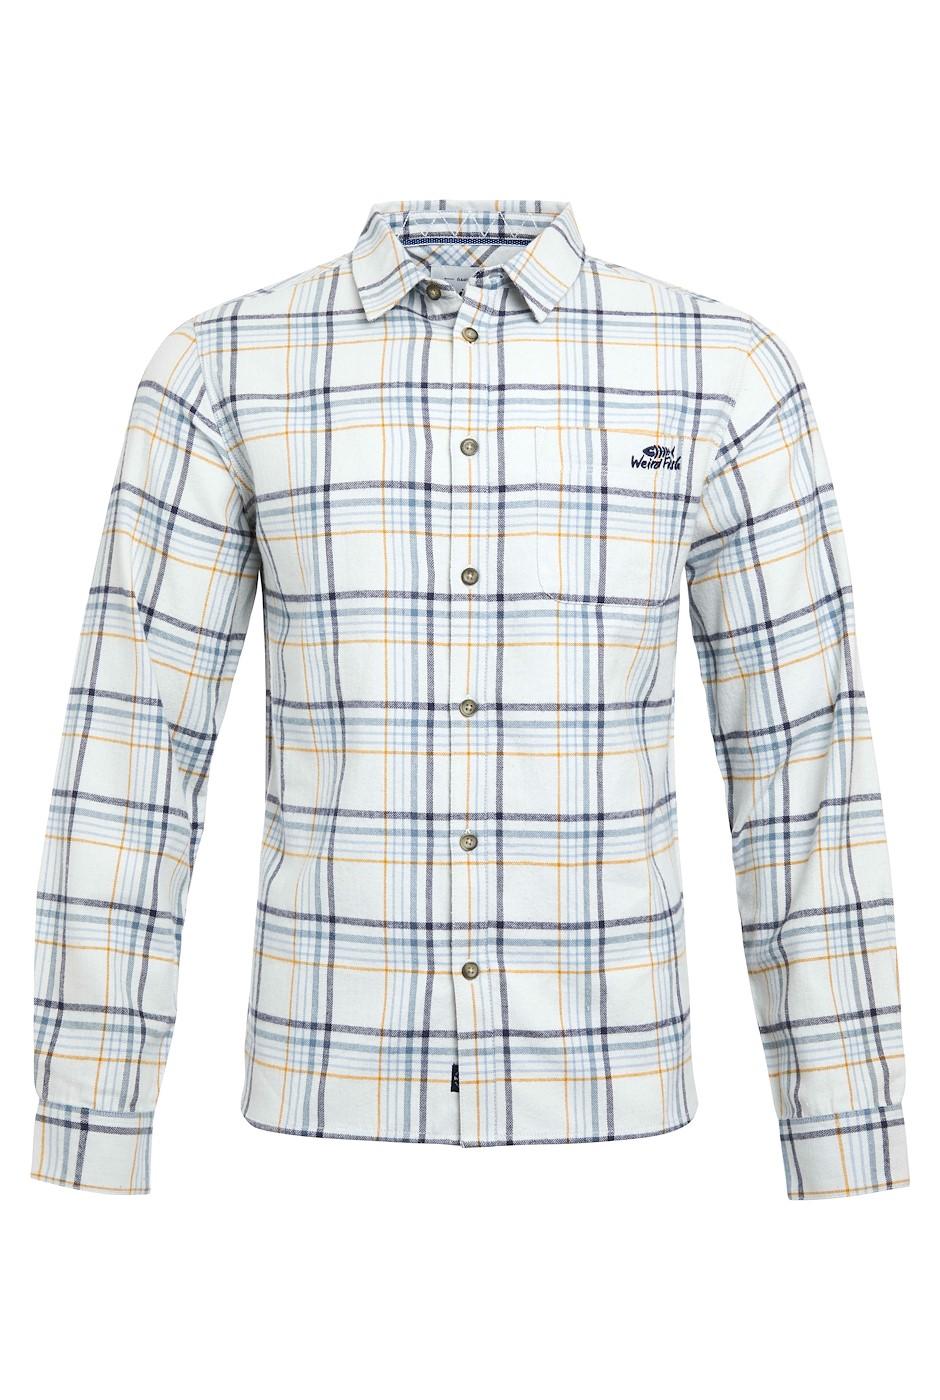 Beasley Organic Long Sleeve Herringbone Check Shirt  Pearl Grey